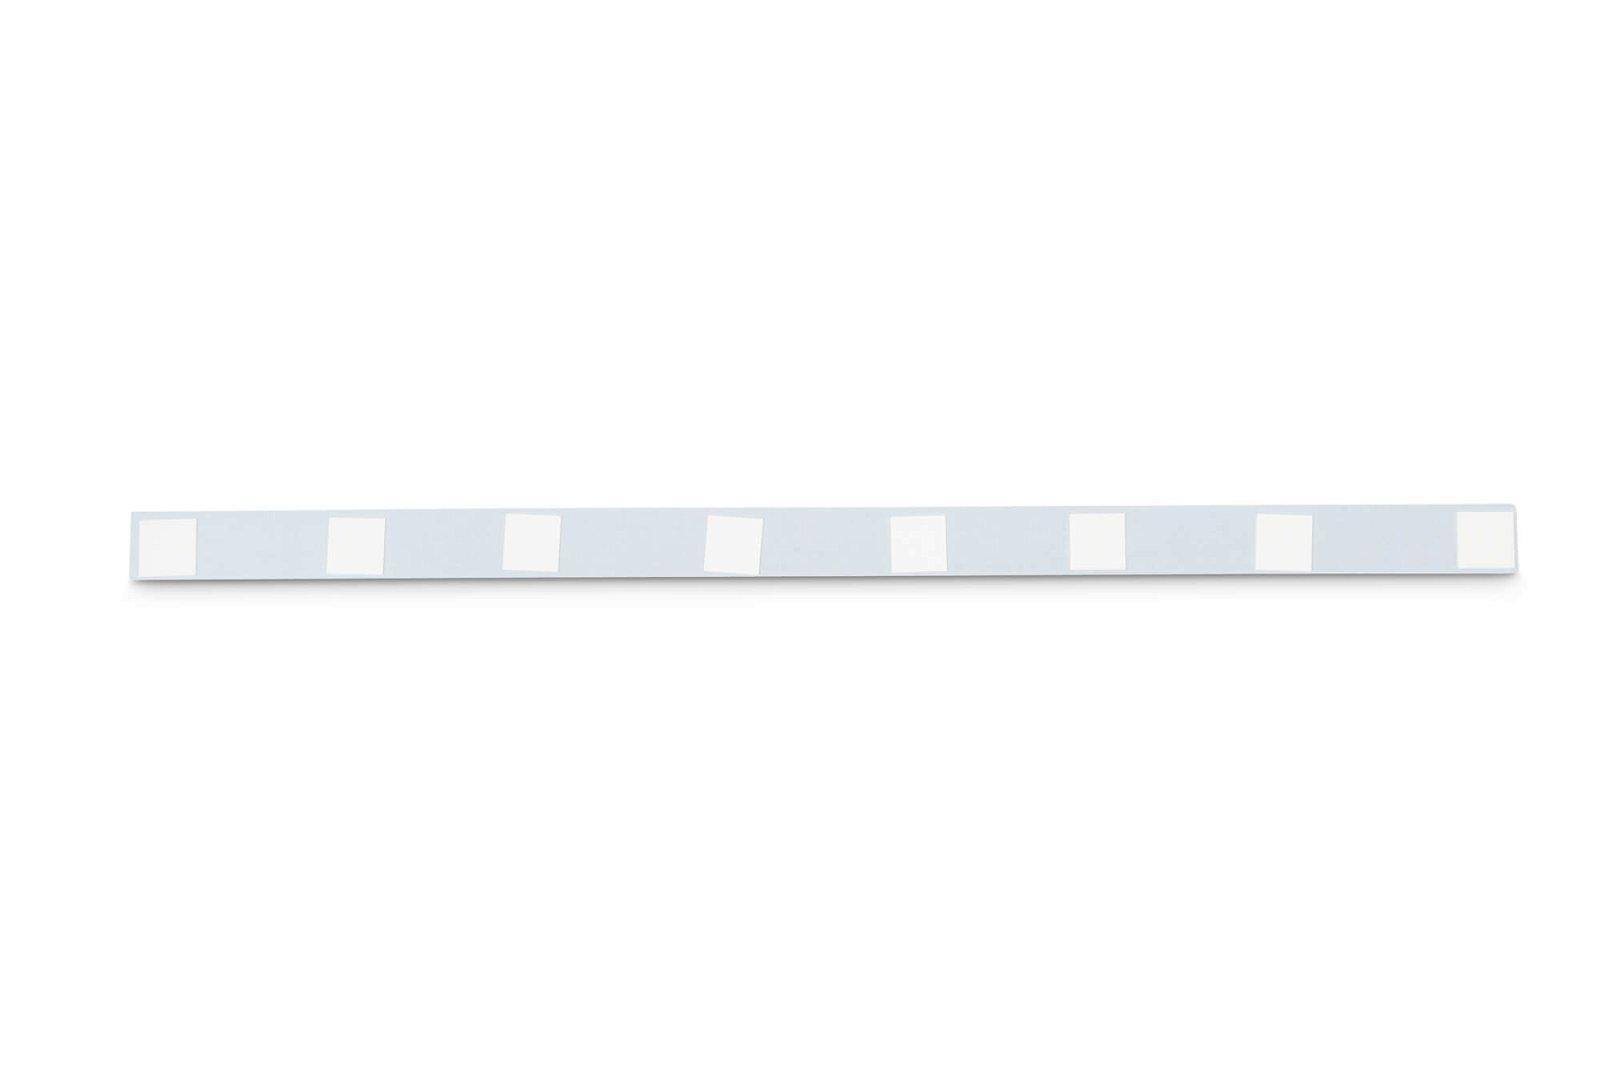 Ferroleiste MAULstandard, Länge 100 cm, weiß